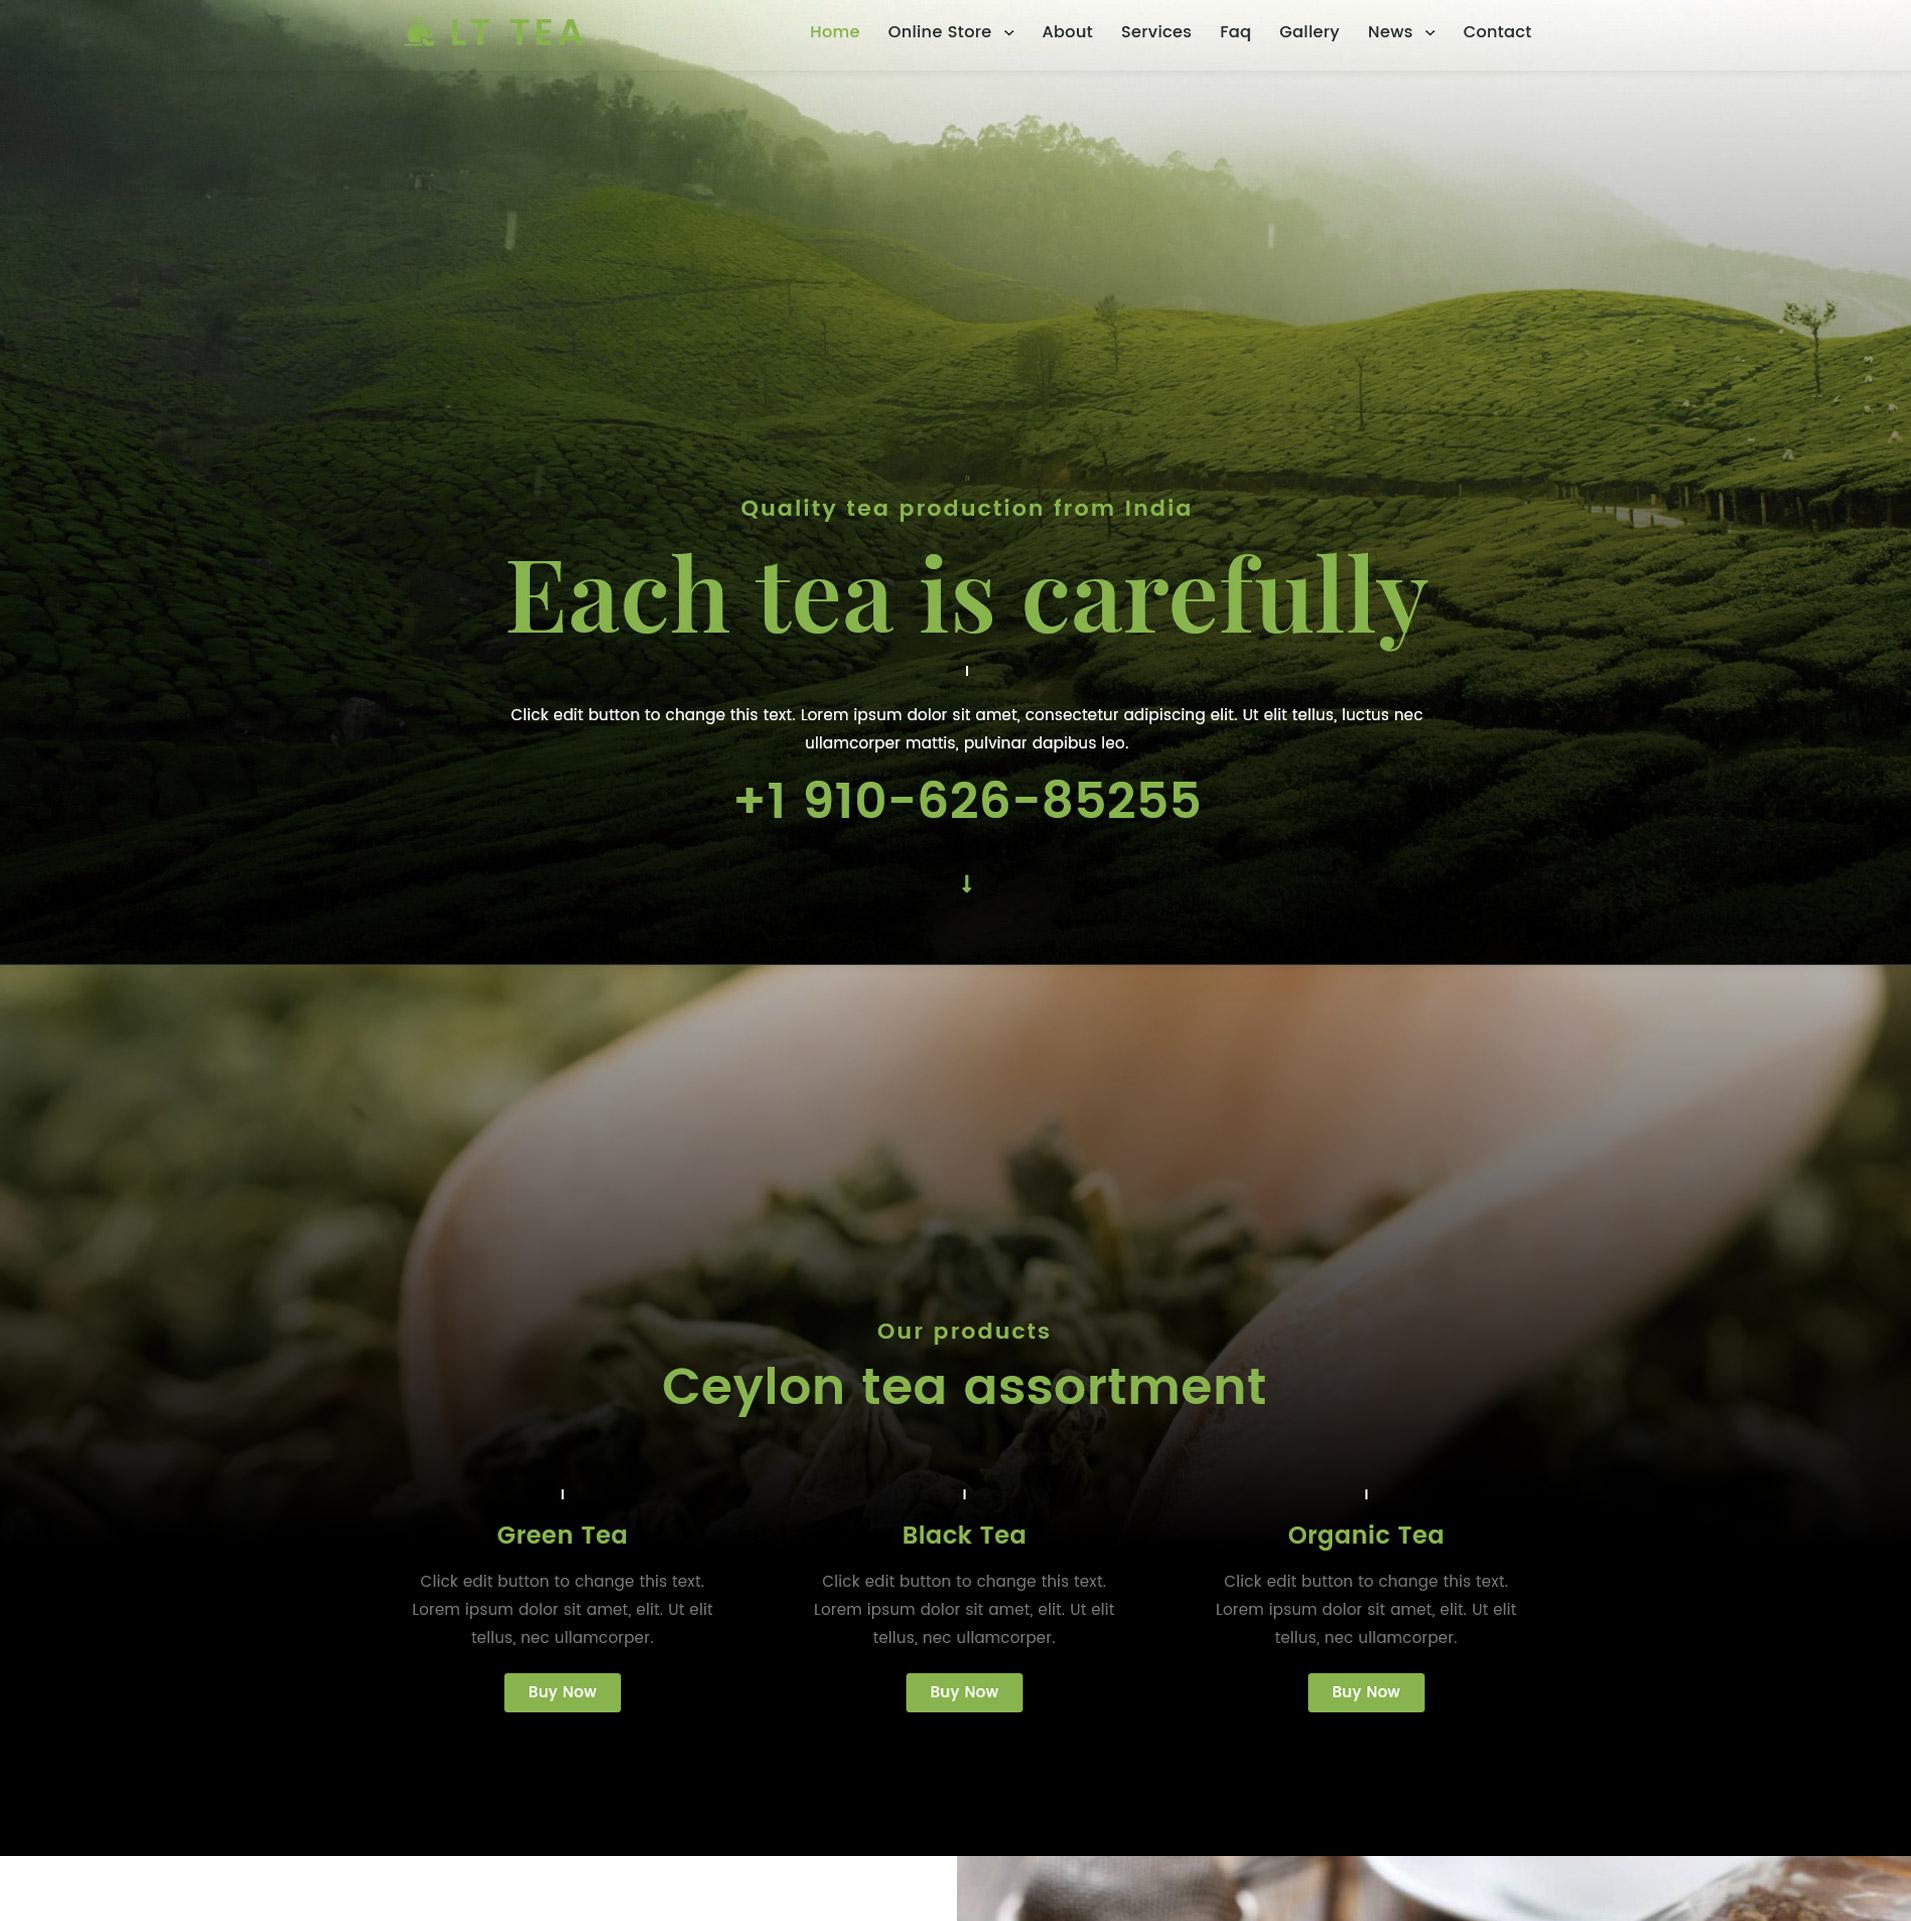 https://ltheme.com/project/lt-tea-free-responsive-tea-store-tea-business-wordpress-theme/